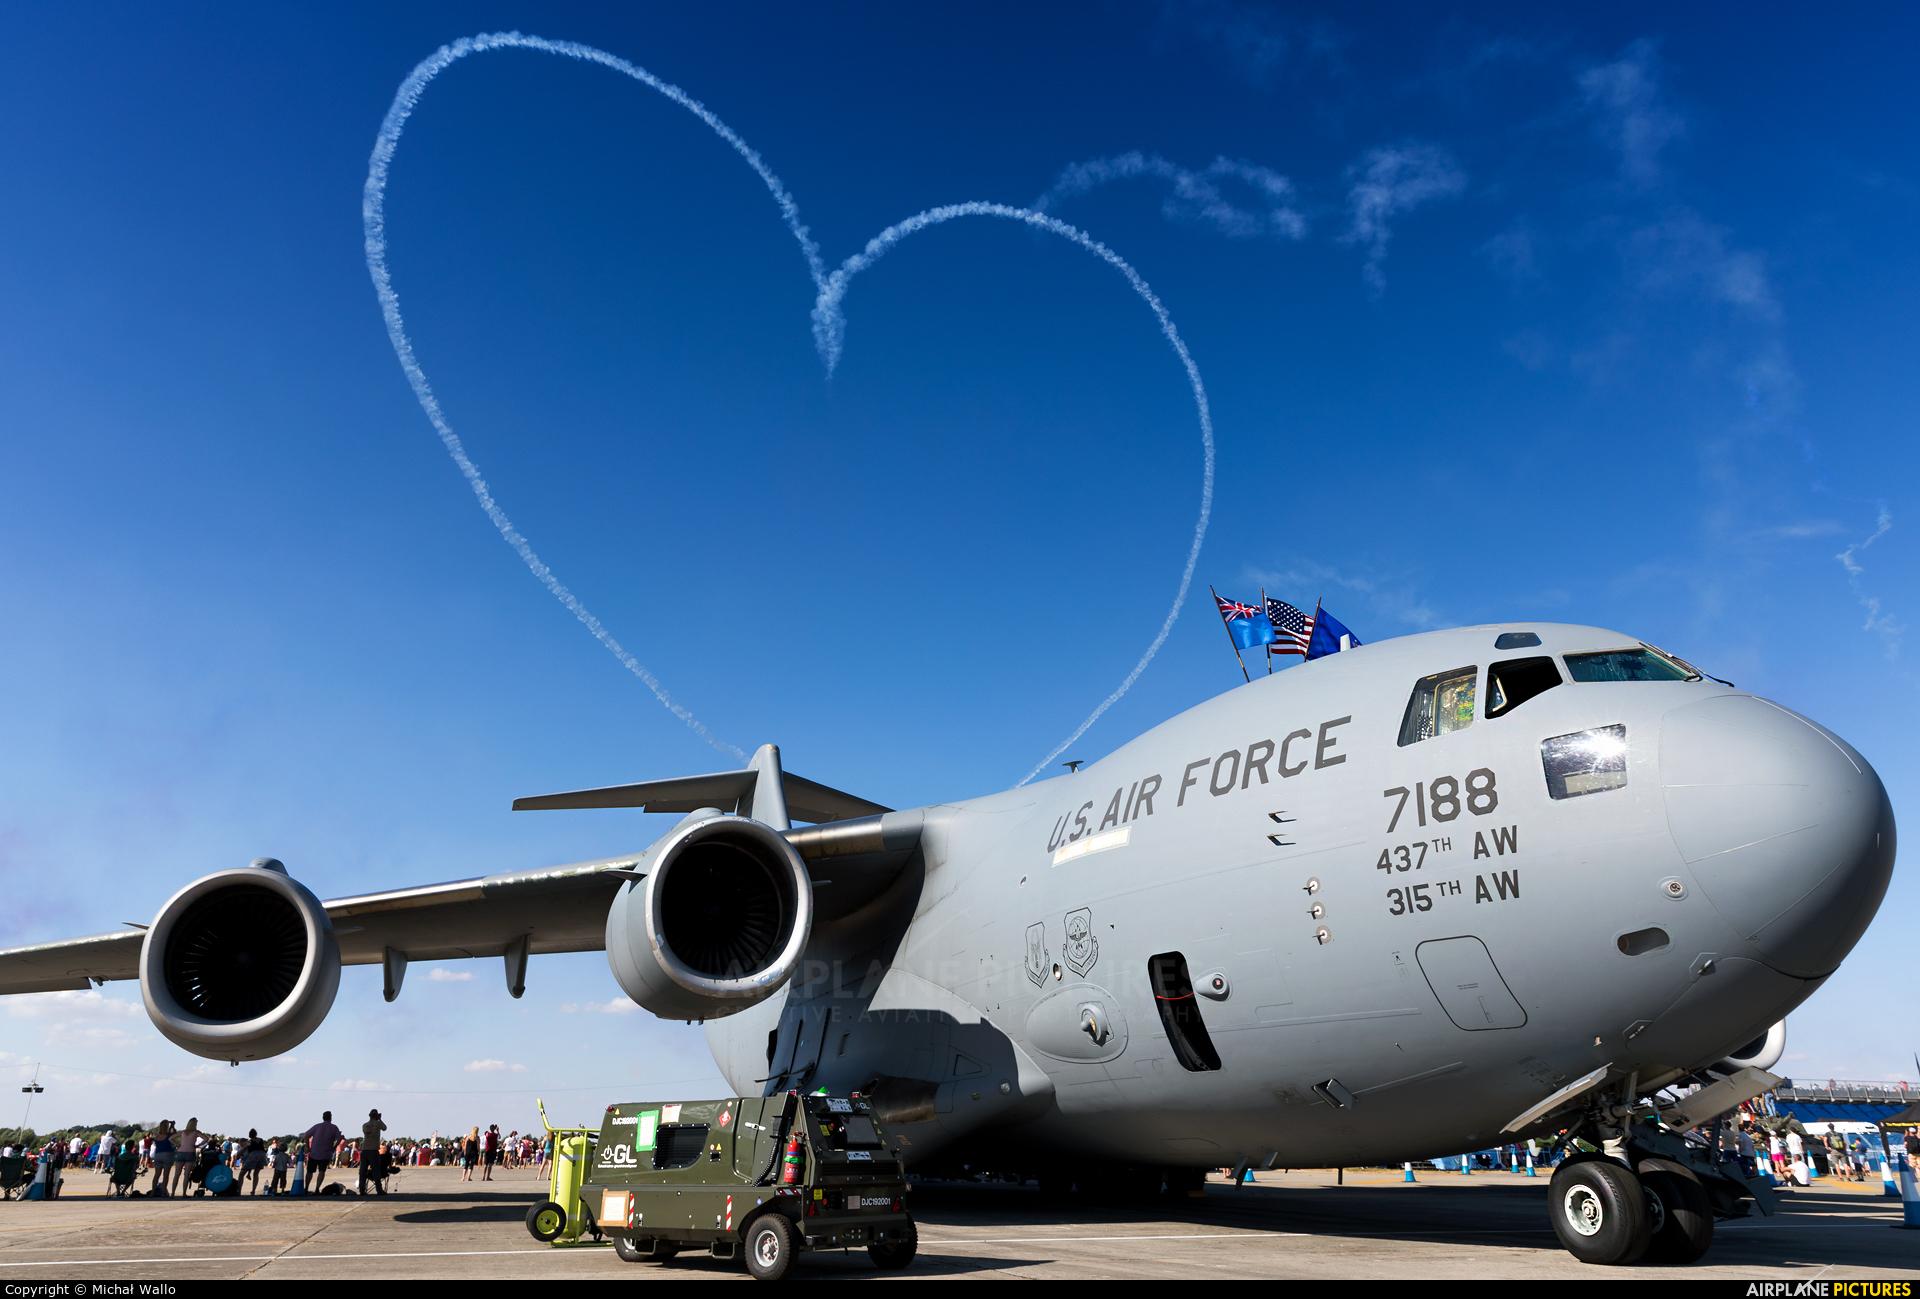 USA - Air Force 07-7188 aircraft at Fairford